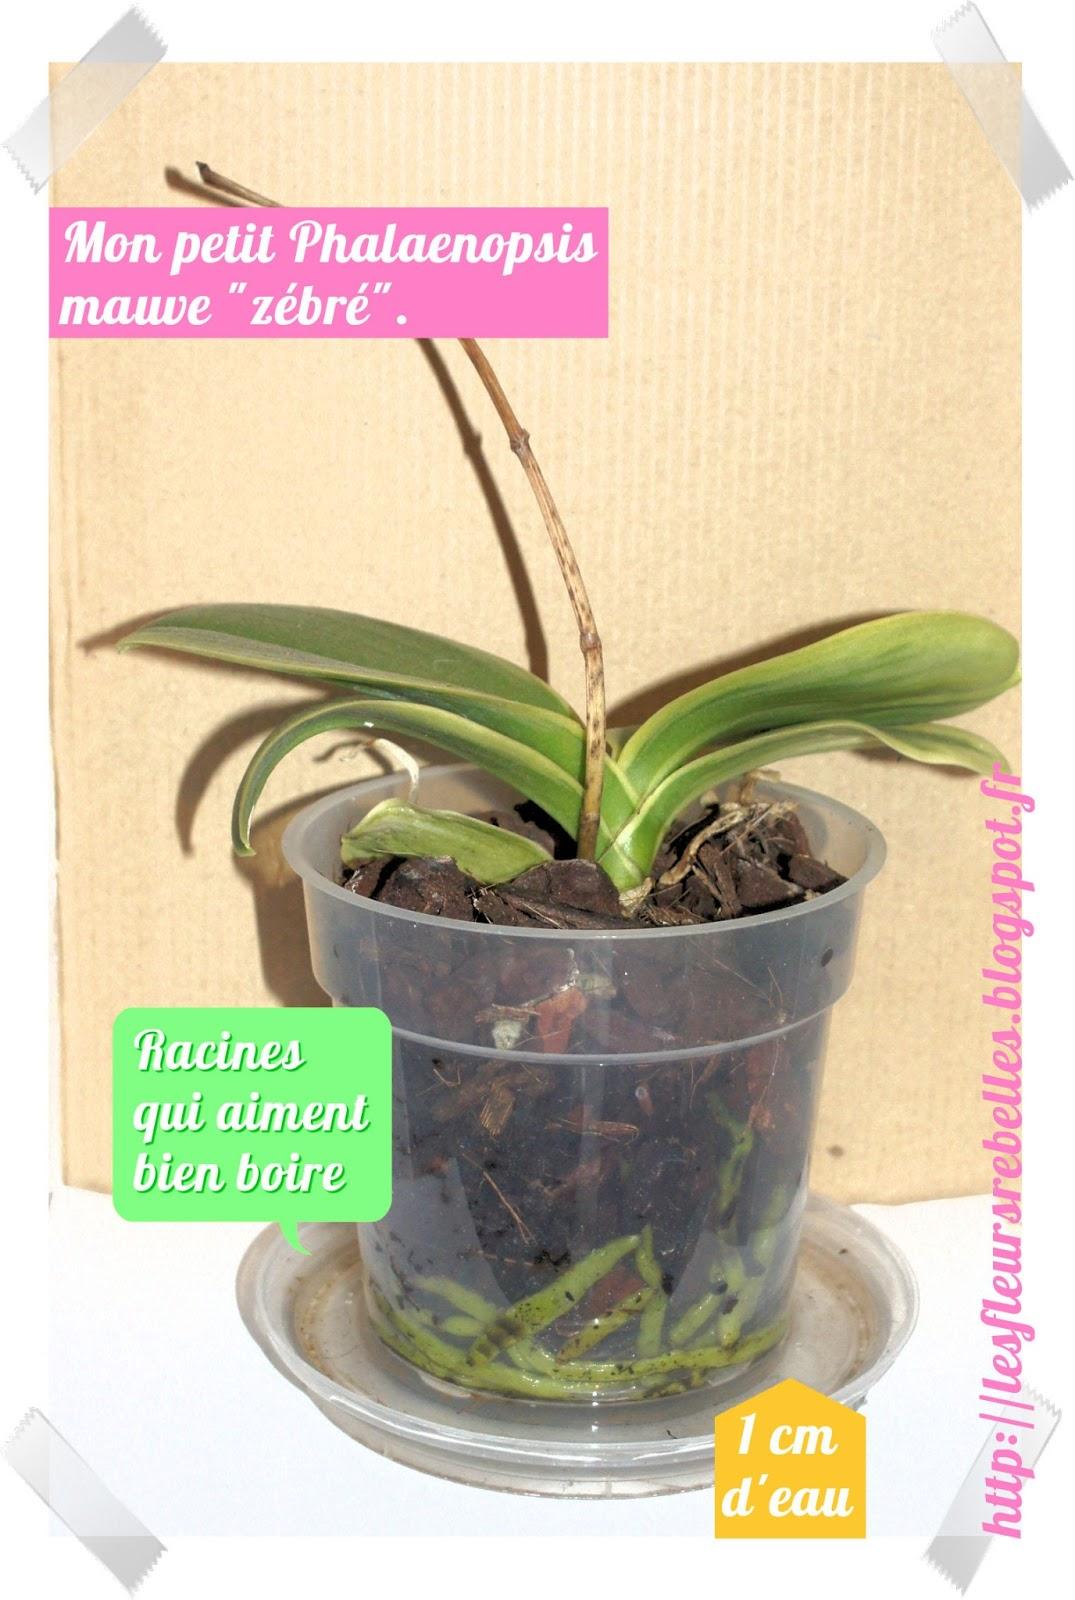 Les fleurs rebelles blog lifestyle diy prendre soin for Plante pendante